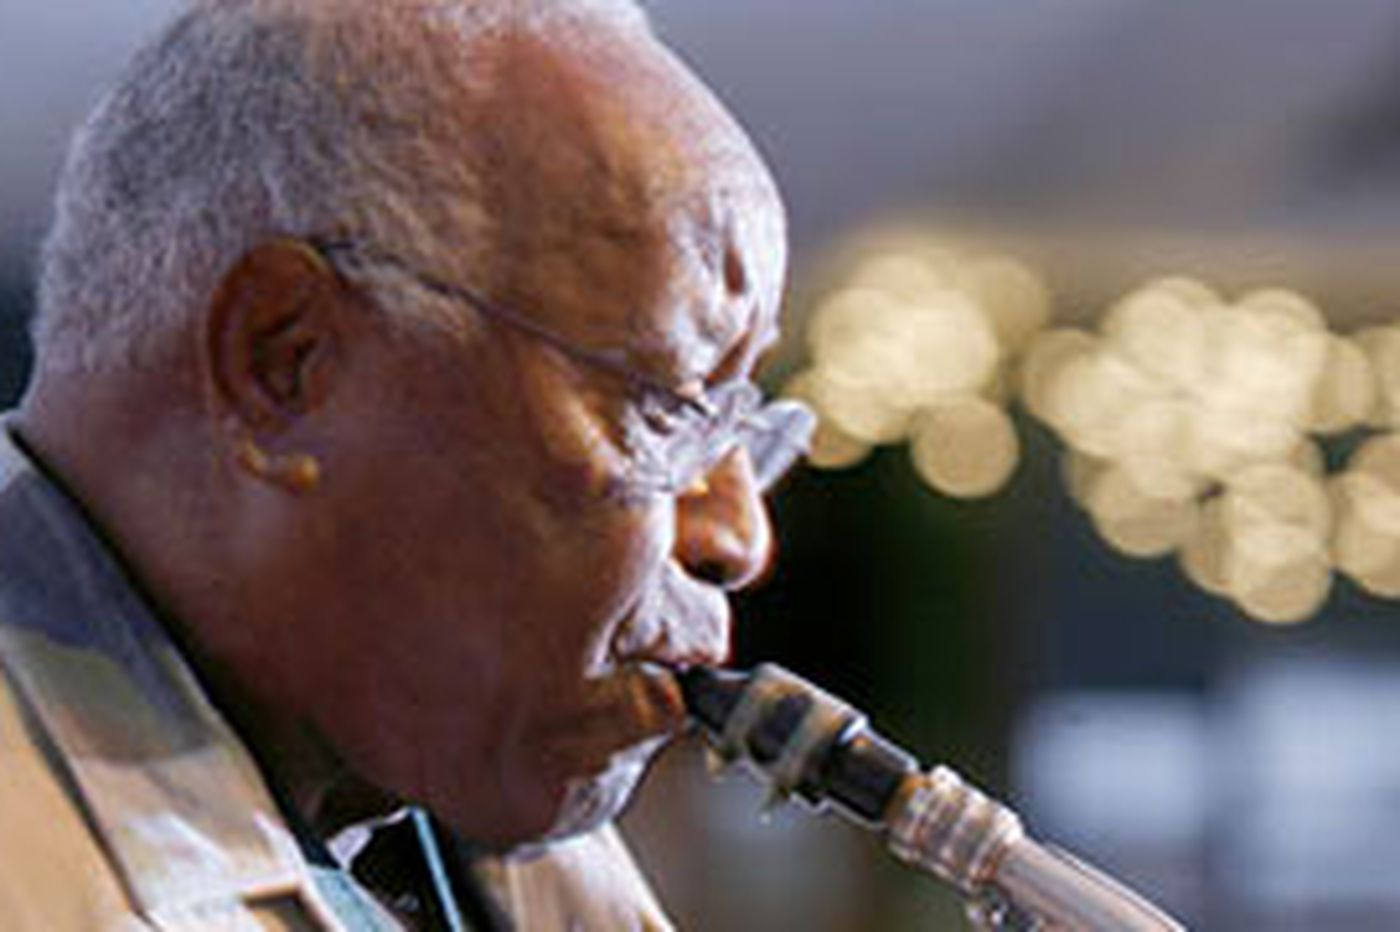 Sax man remains a tireless champion of jazz